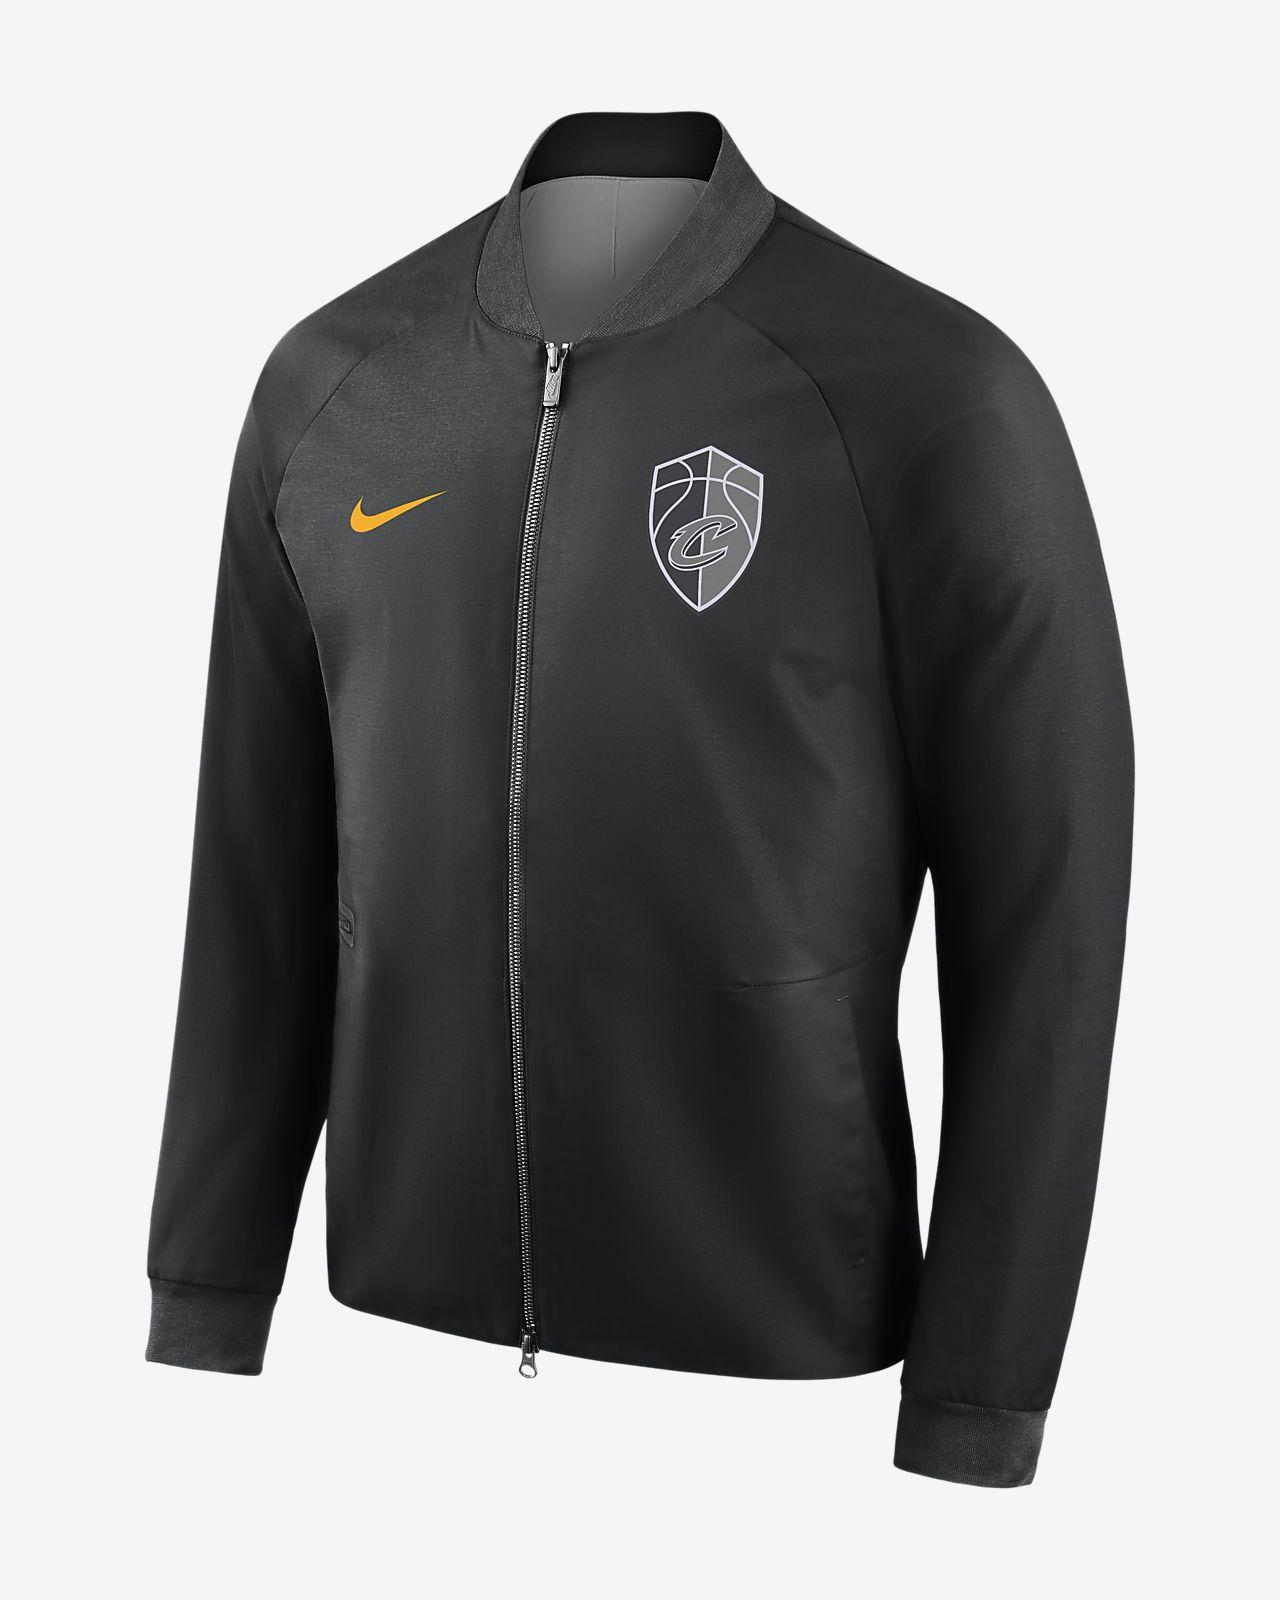 cae9bf50b4b6 Men s NBA Varsity Jacket. Cleveland Cavaliers City Edition Nike Modern